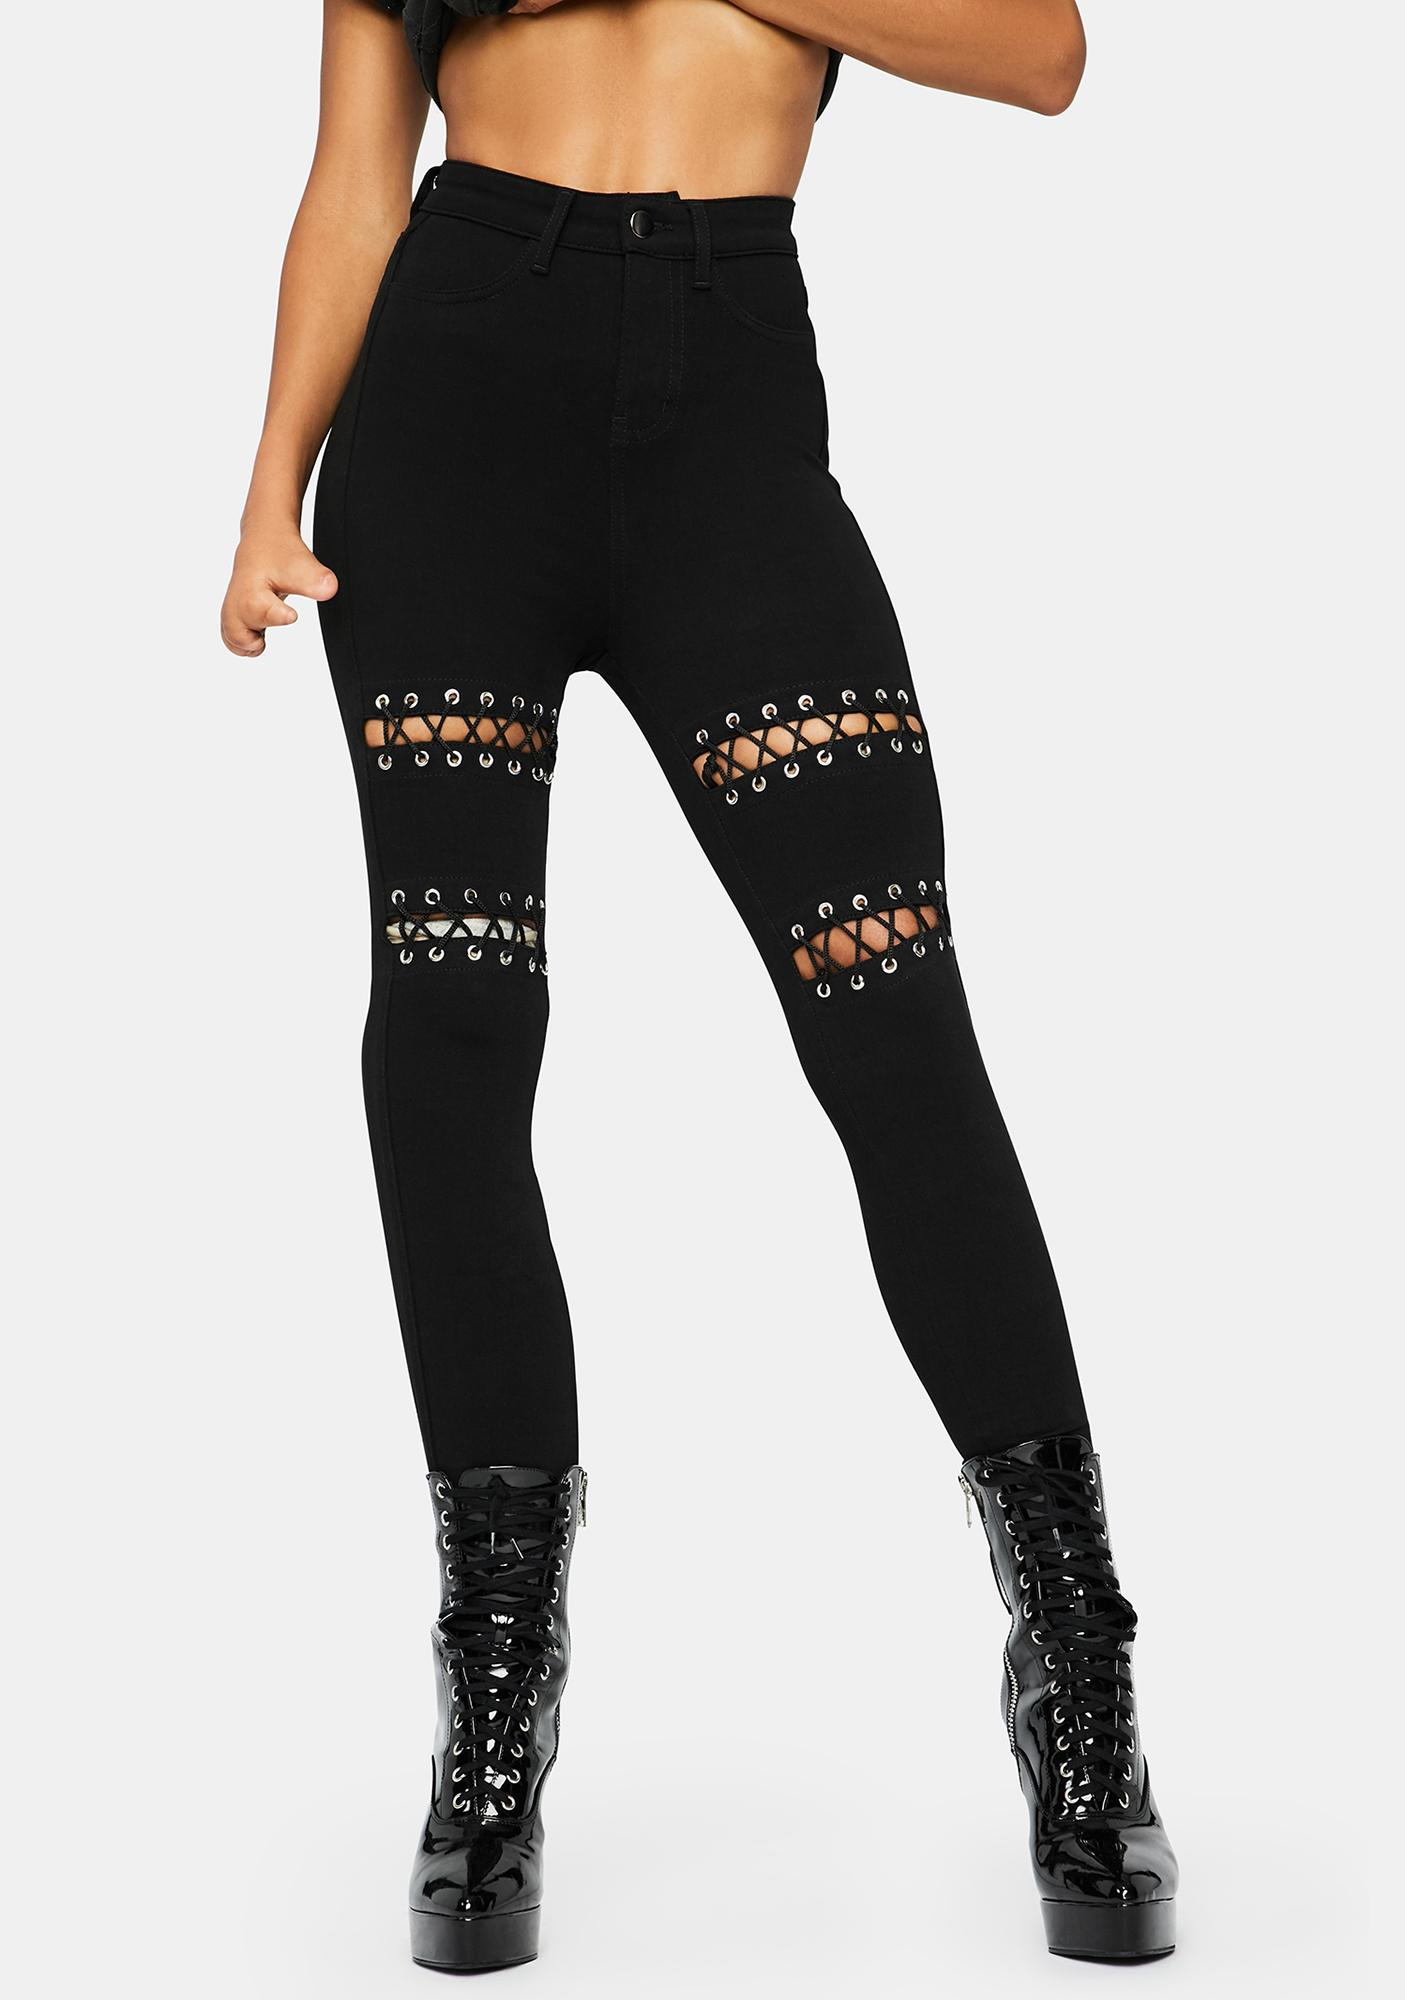 Rocker Grunge Stretch Jeans